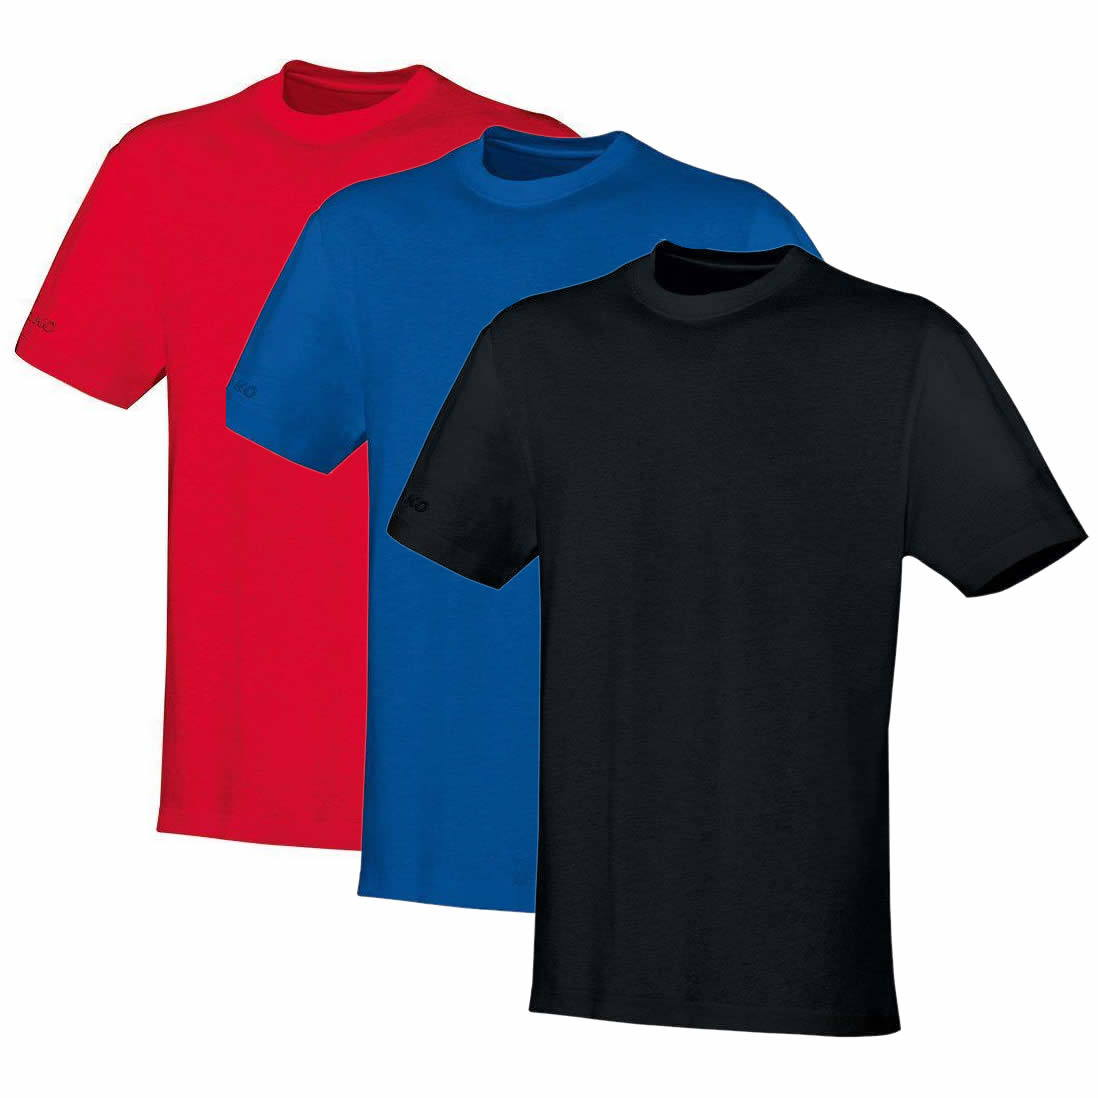 Jako T-Shirt in Übergröße